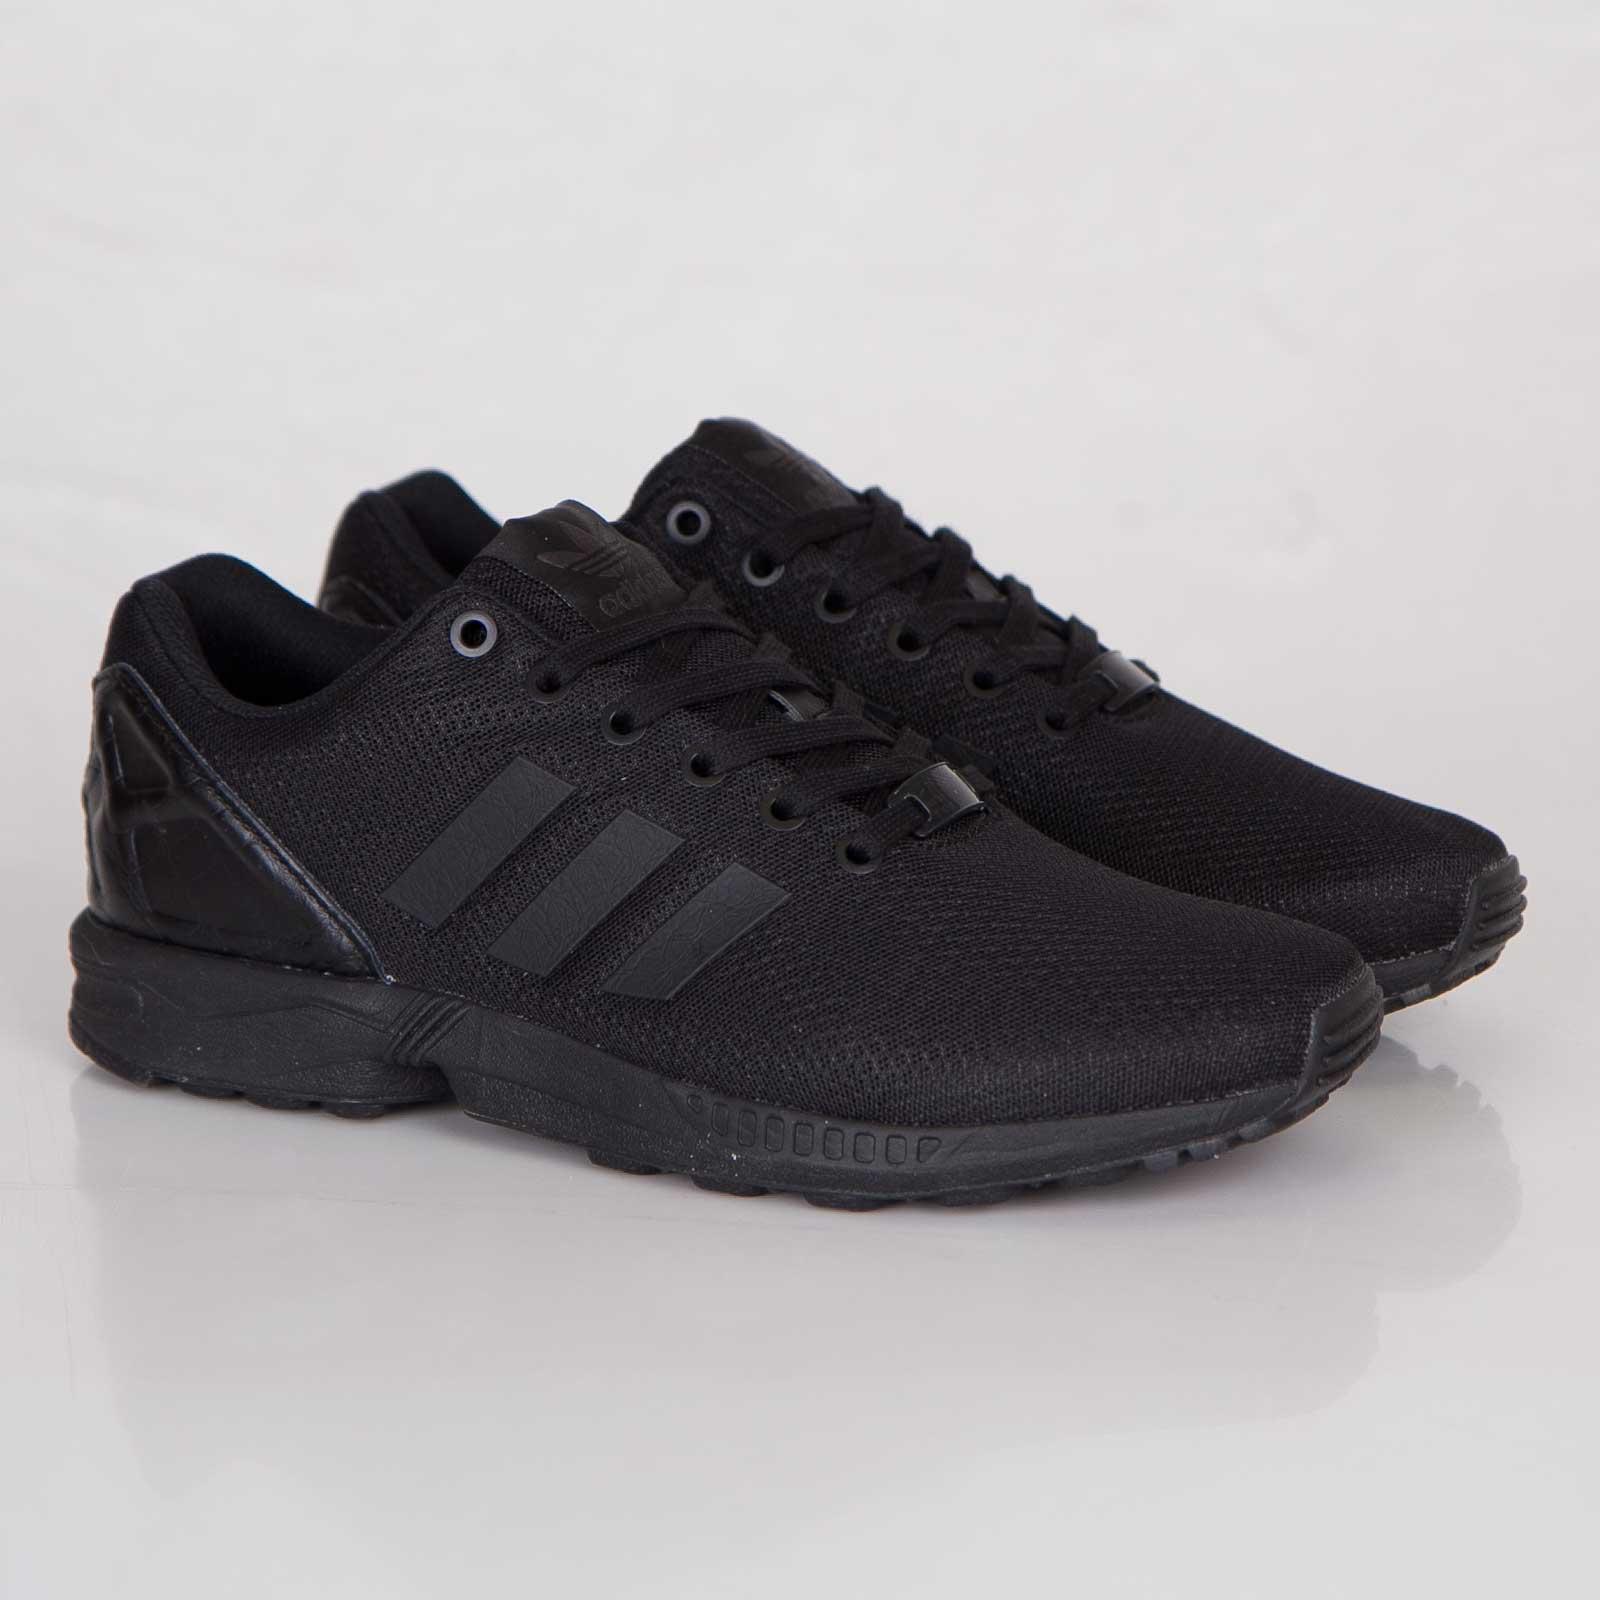 adidas ZX Flux M22507 Sneakersnstuff | sneakers